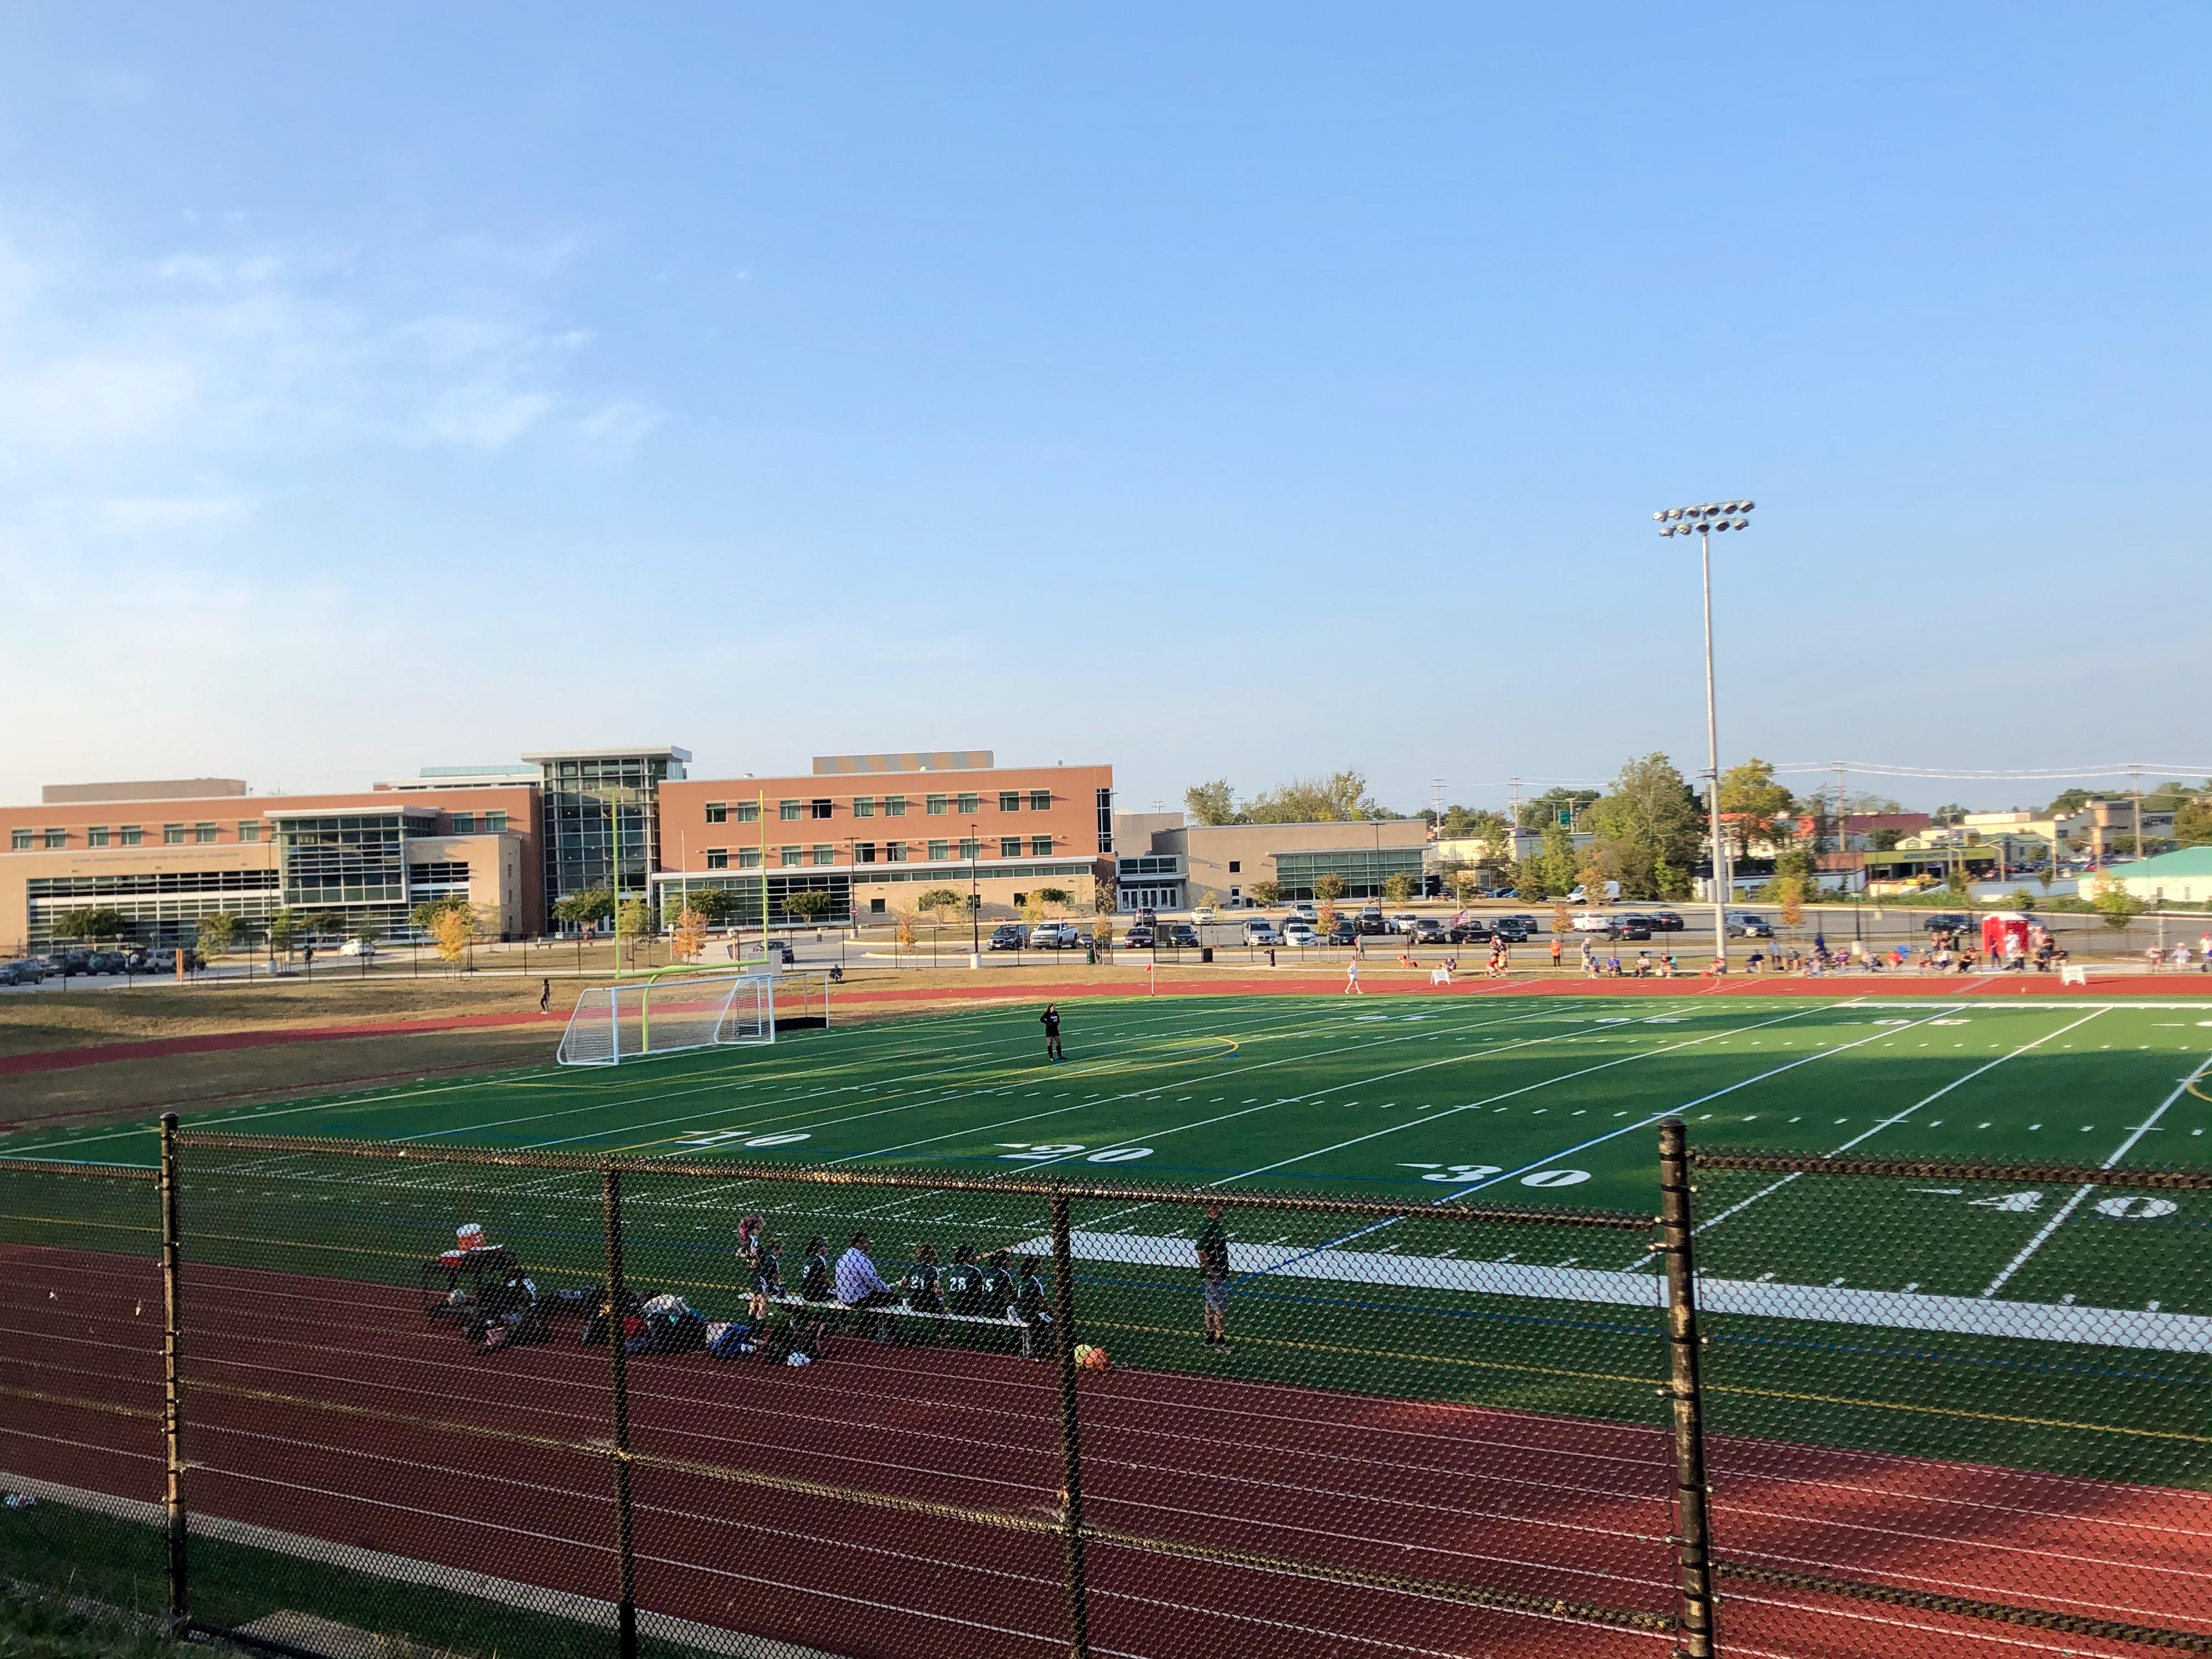 Child Custody Access at Sports Games at George Washington Carver High School